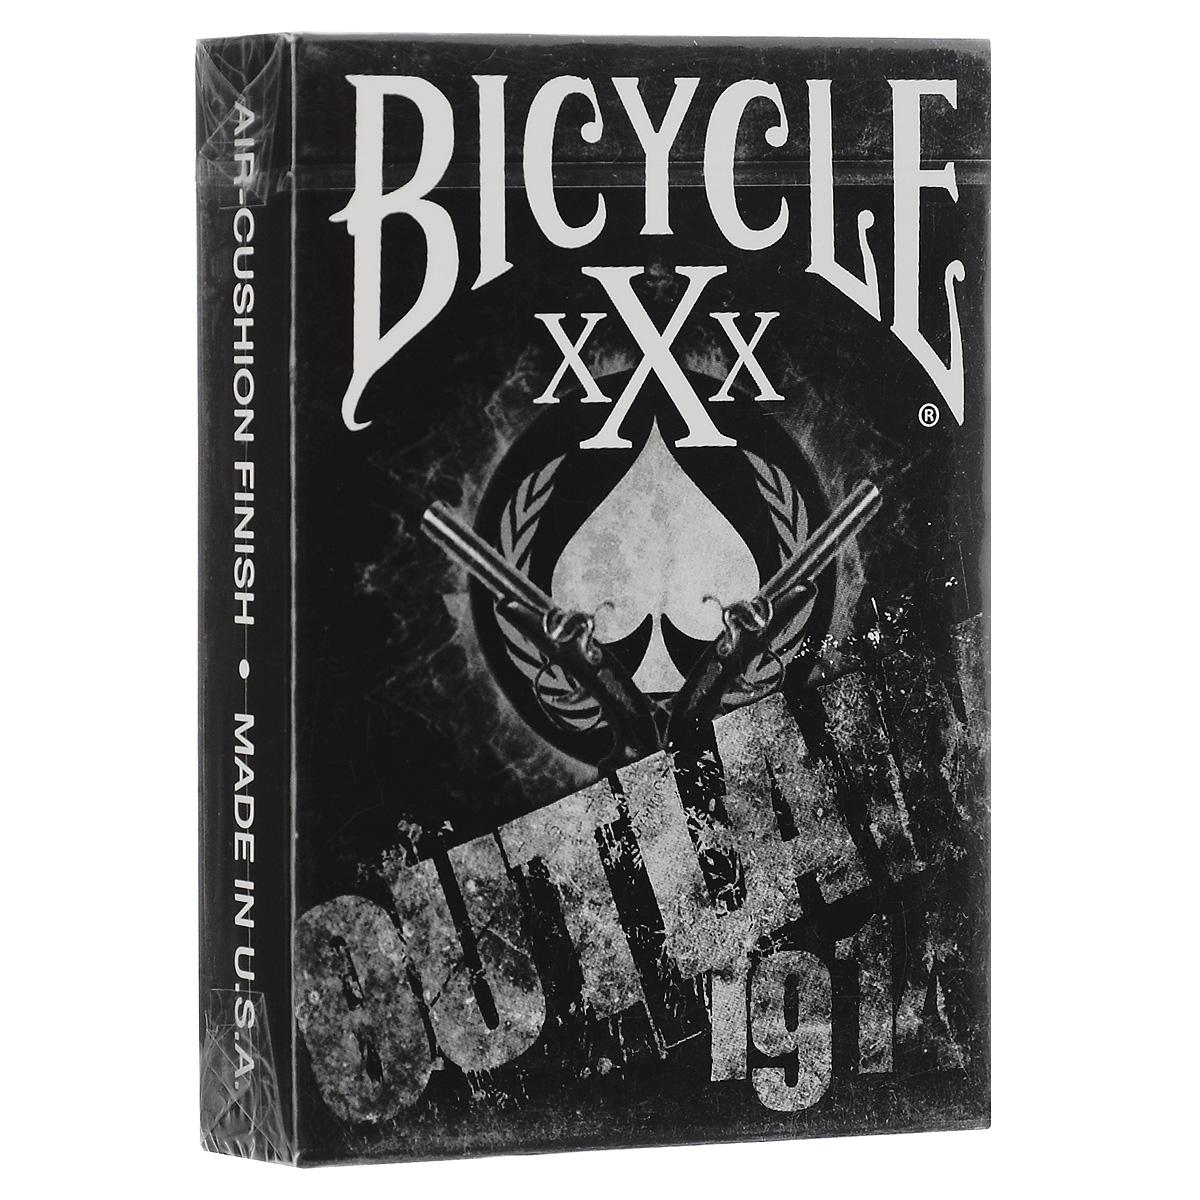 Игральные карты Bicycle Outlaw, цвет: черный, белый mymei outdoor 90db ring alarm loud horn aluminum bicycle bike safety handlebar bell